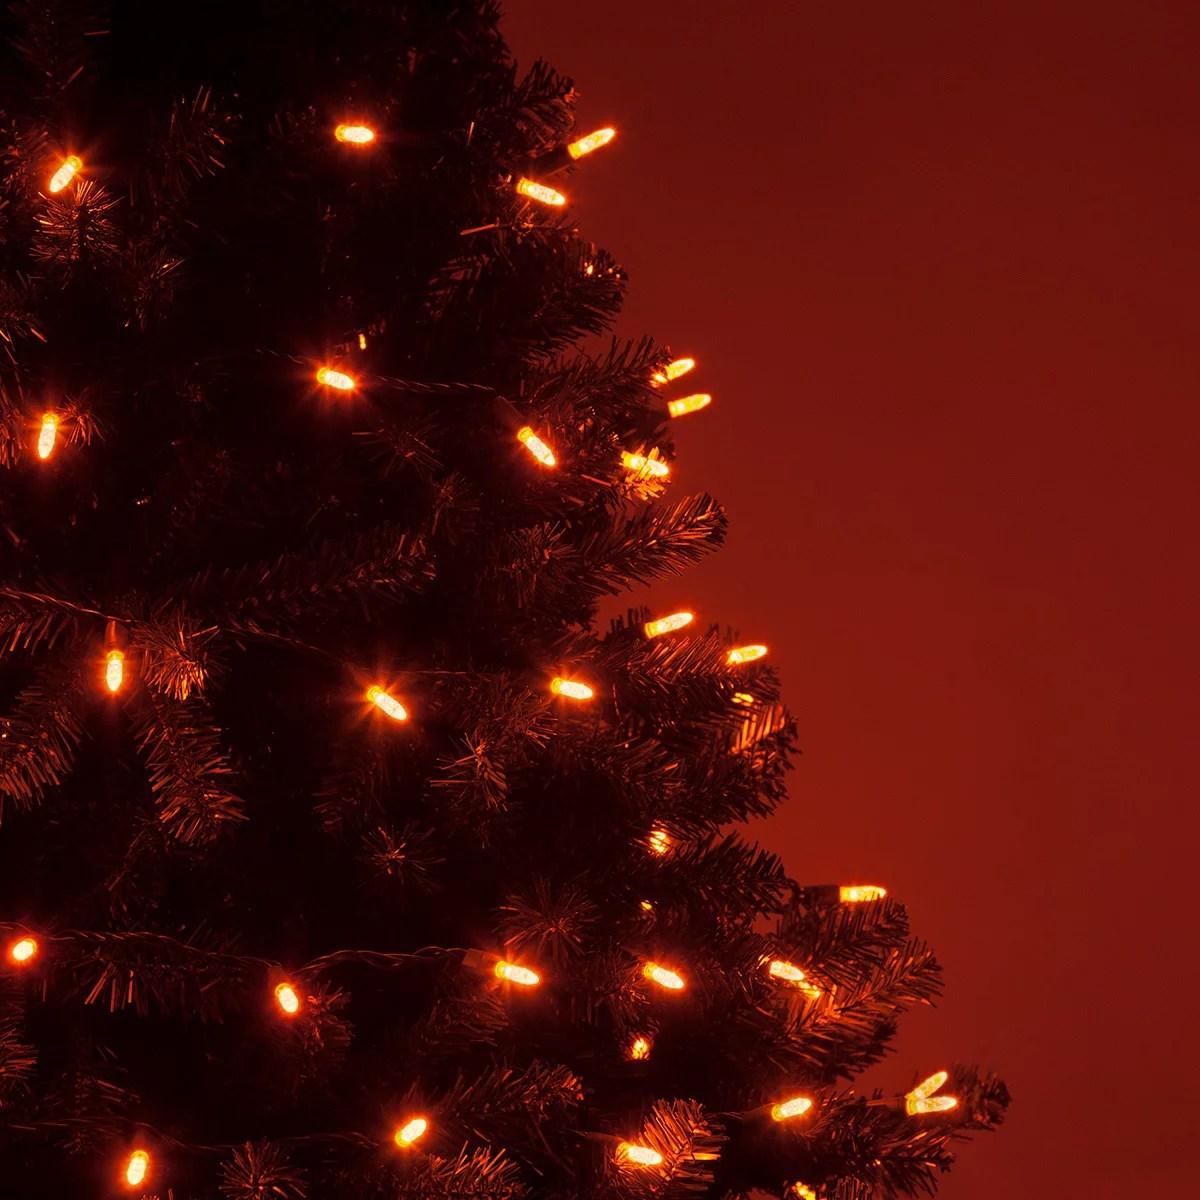 https eurasiatravelnetwork com string lights 774672 orange indooroutdoor mini light string for christmas event party green cord holiday ul